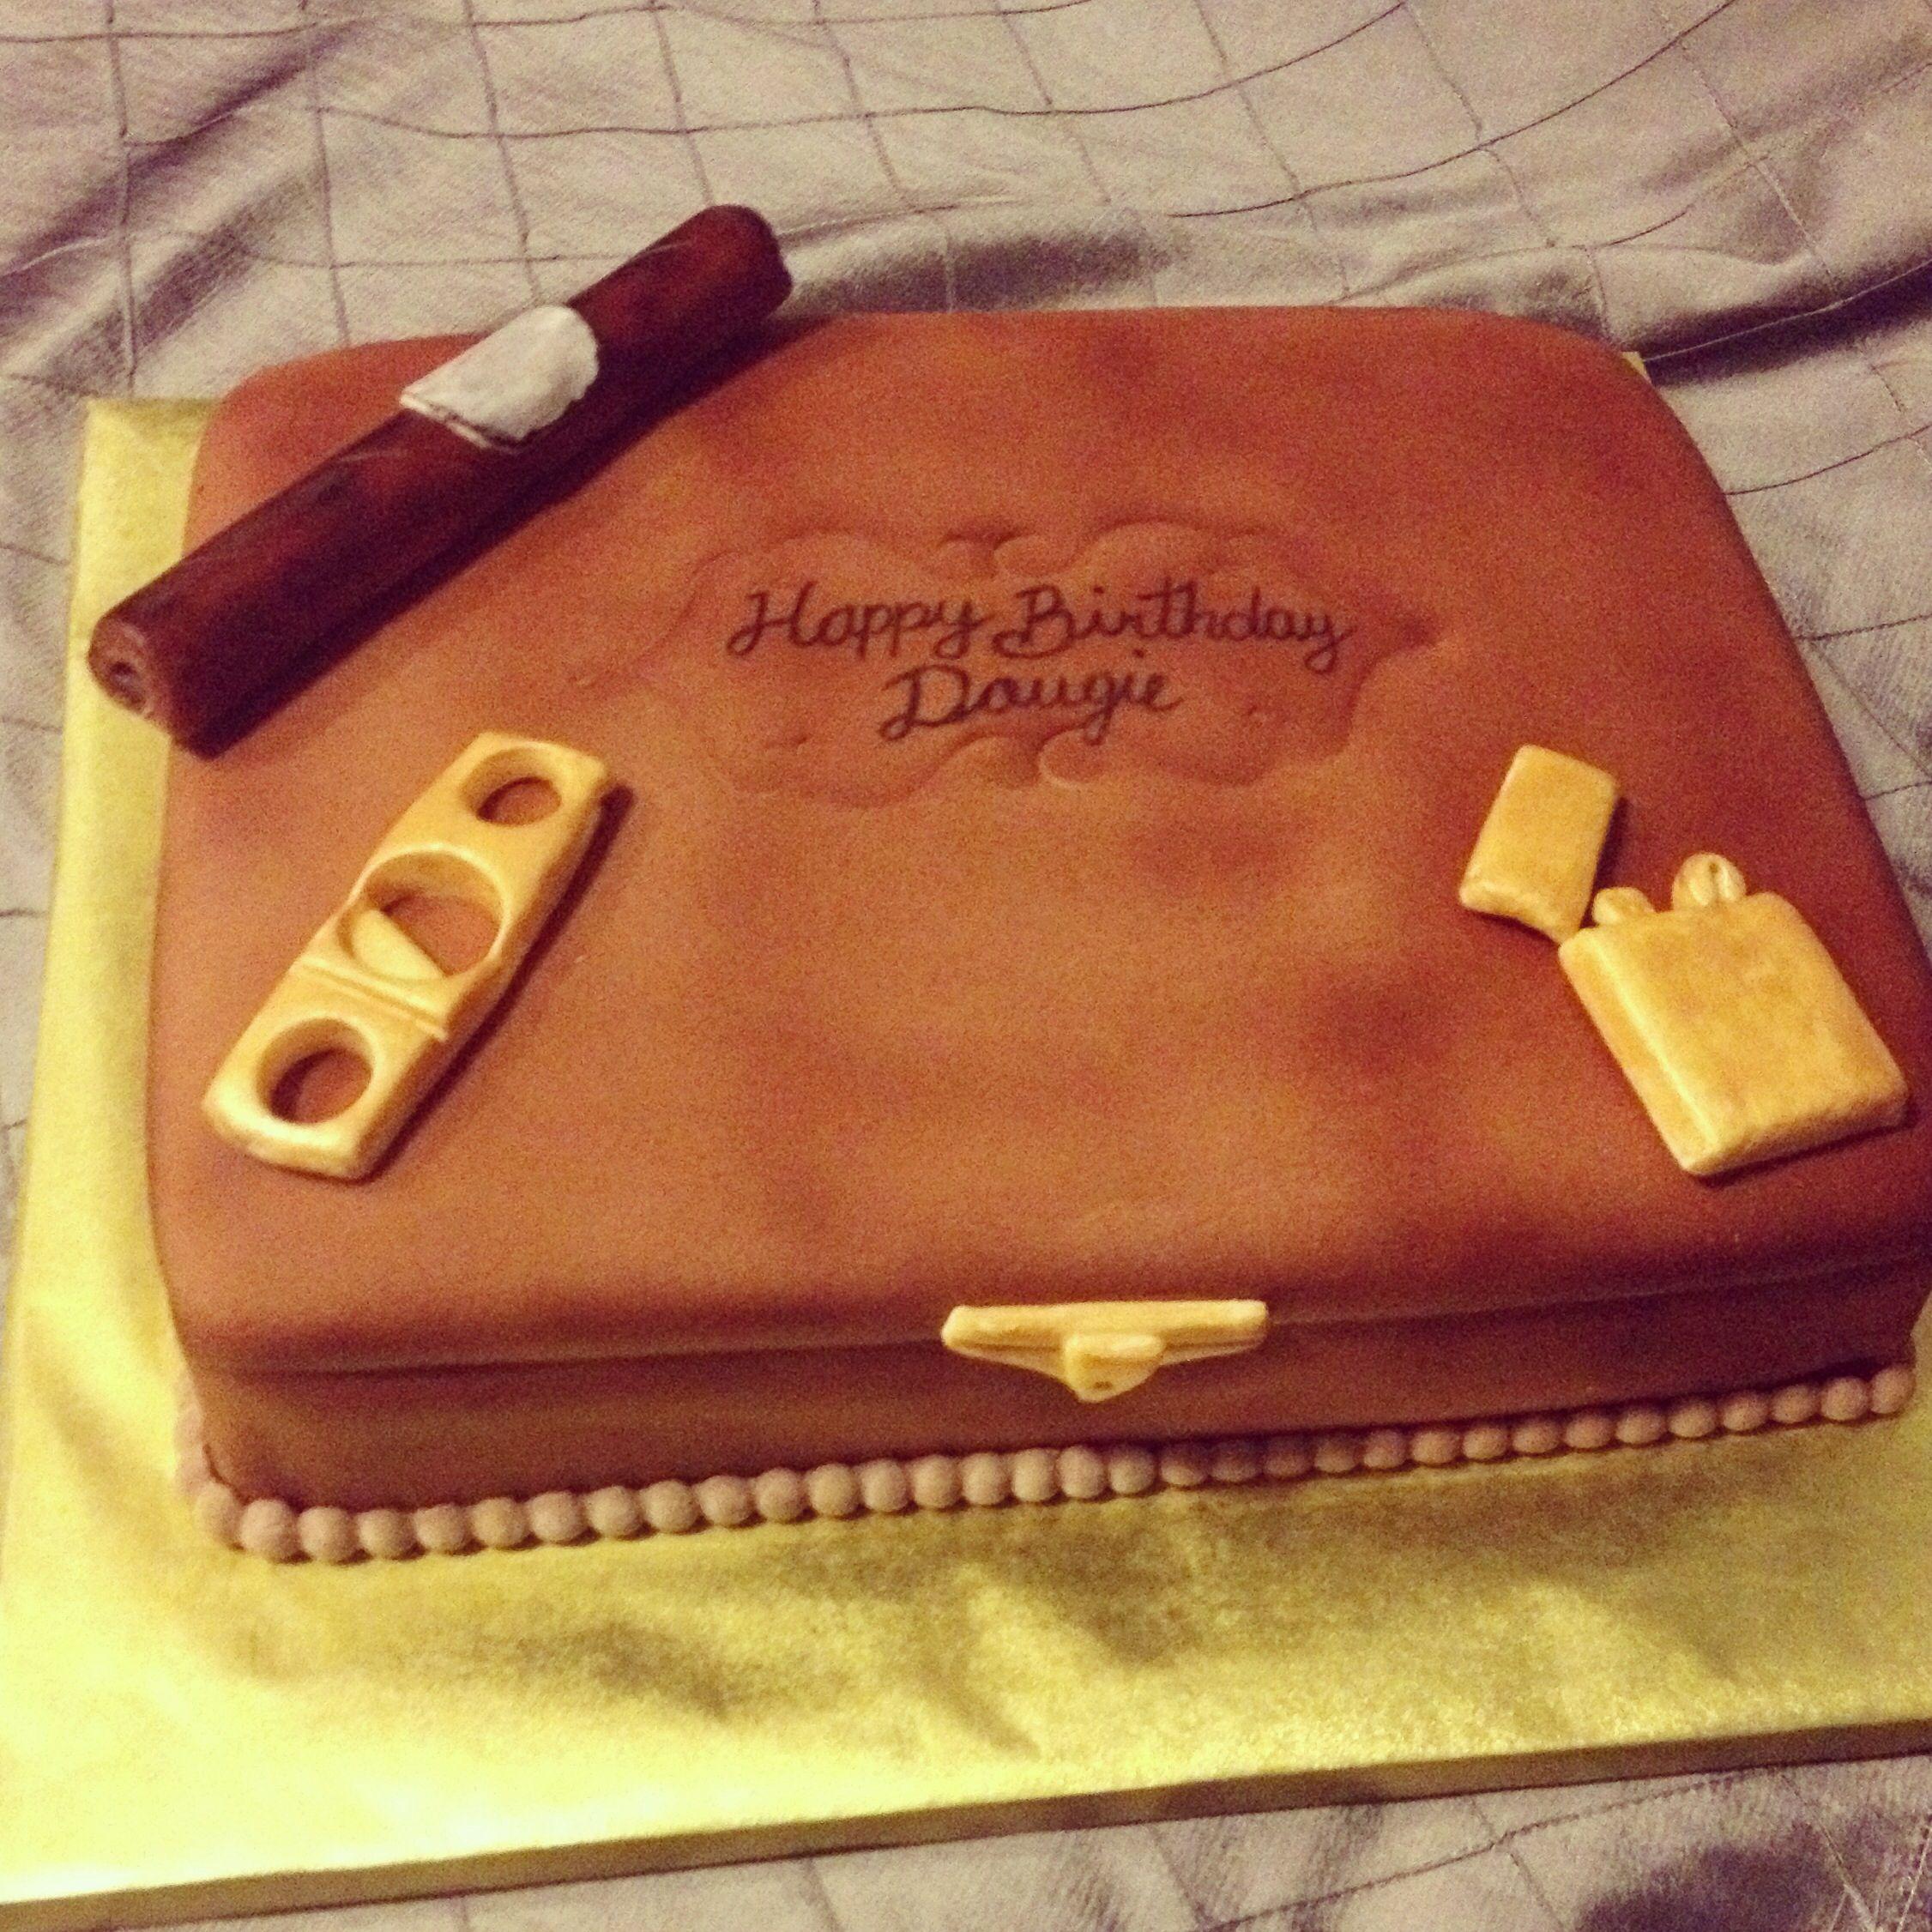 Cigar box cake | Cakes for all occasions | Cigar cake, Cigar box ...